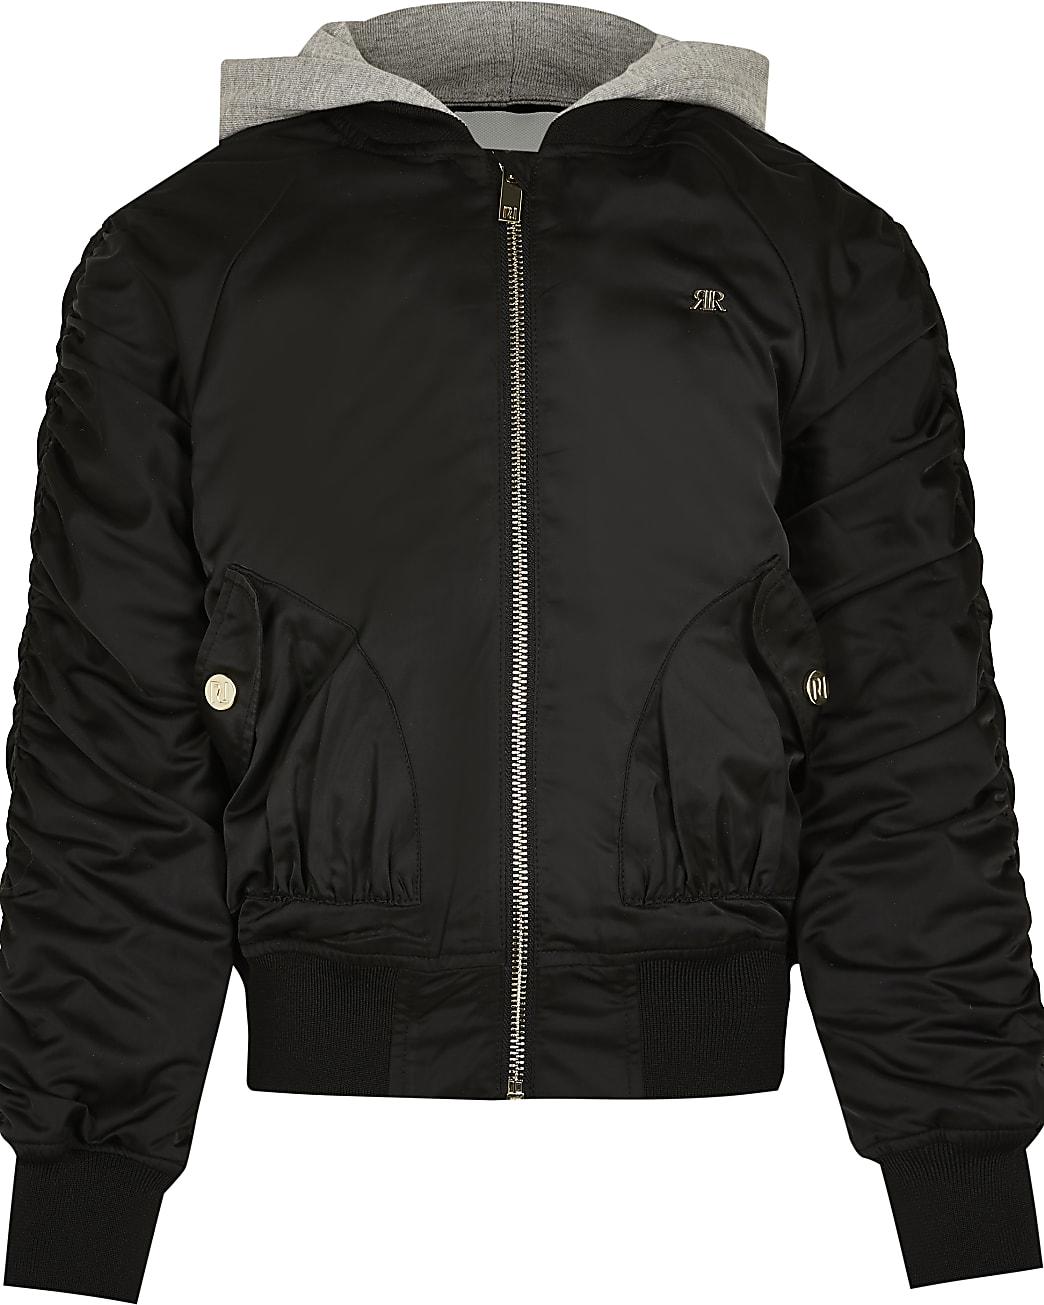 Girls black hooded ruched bomber jacket